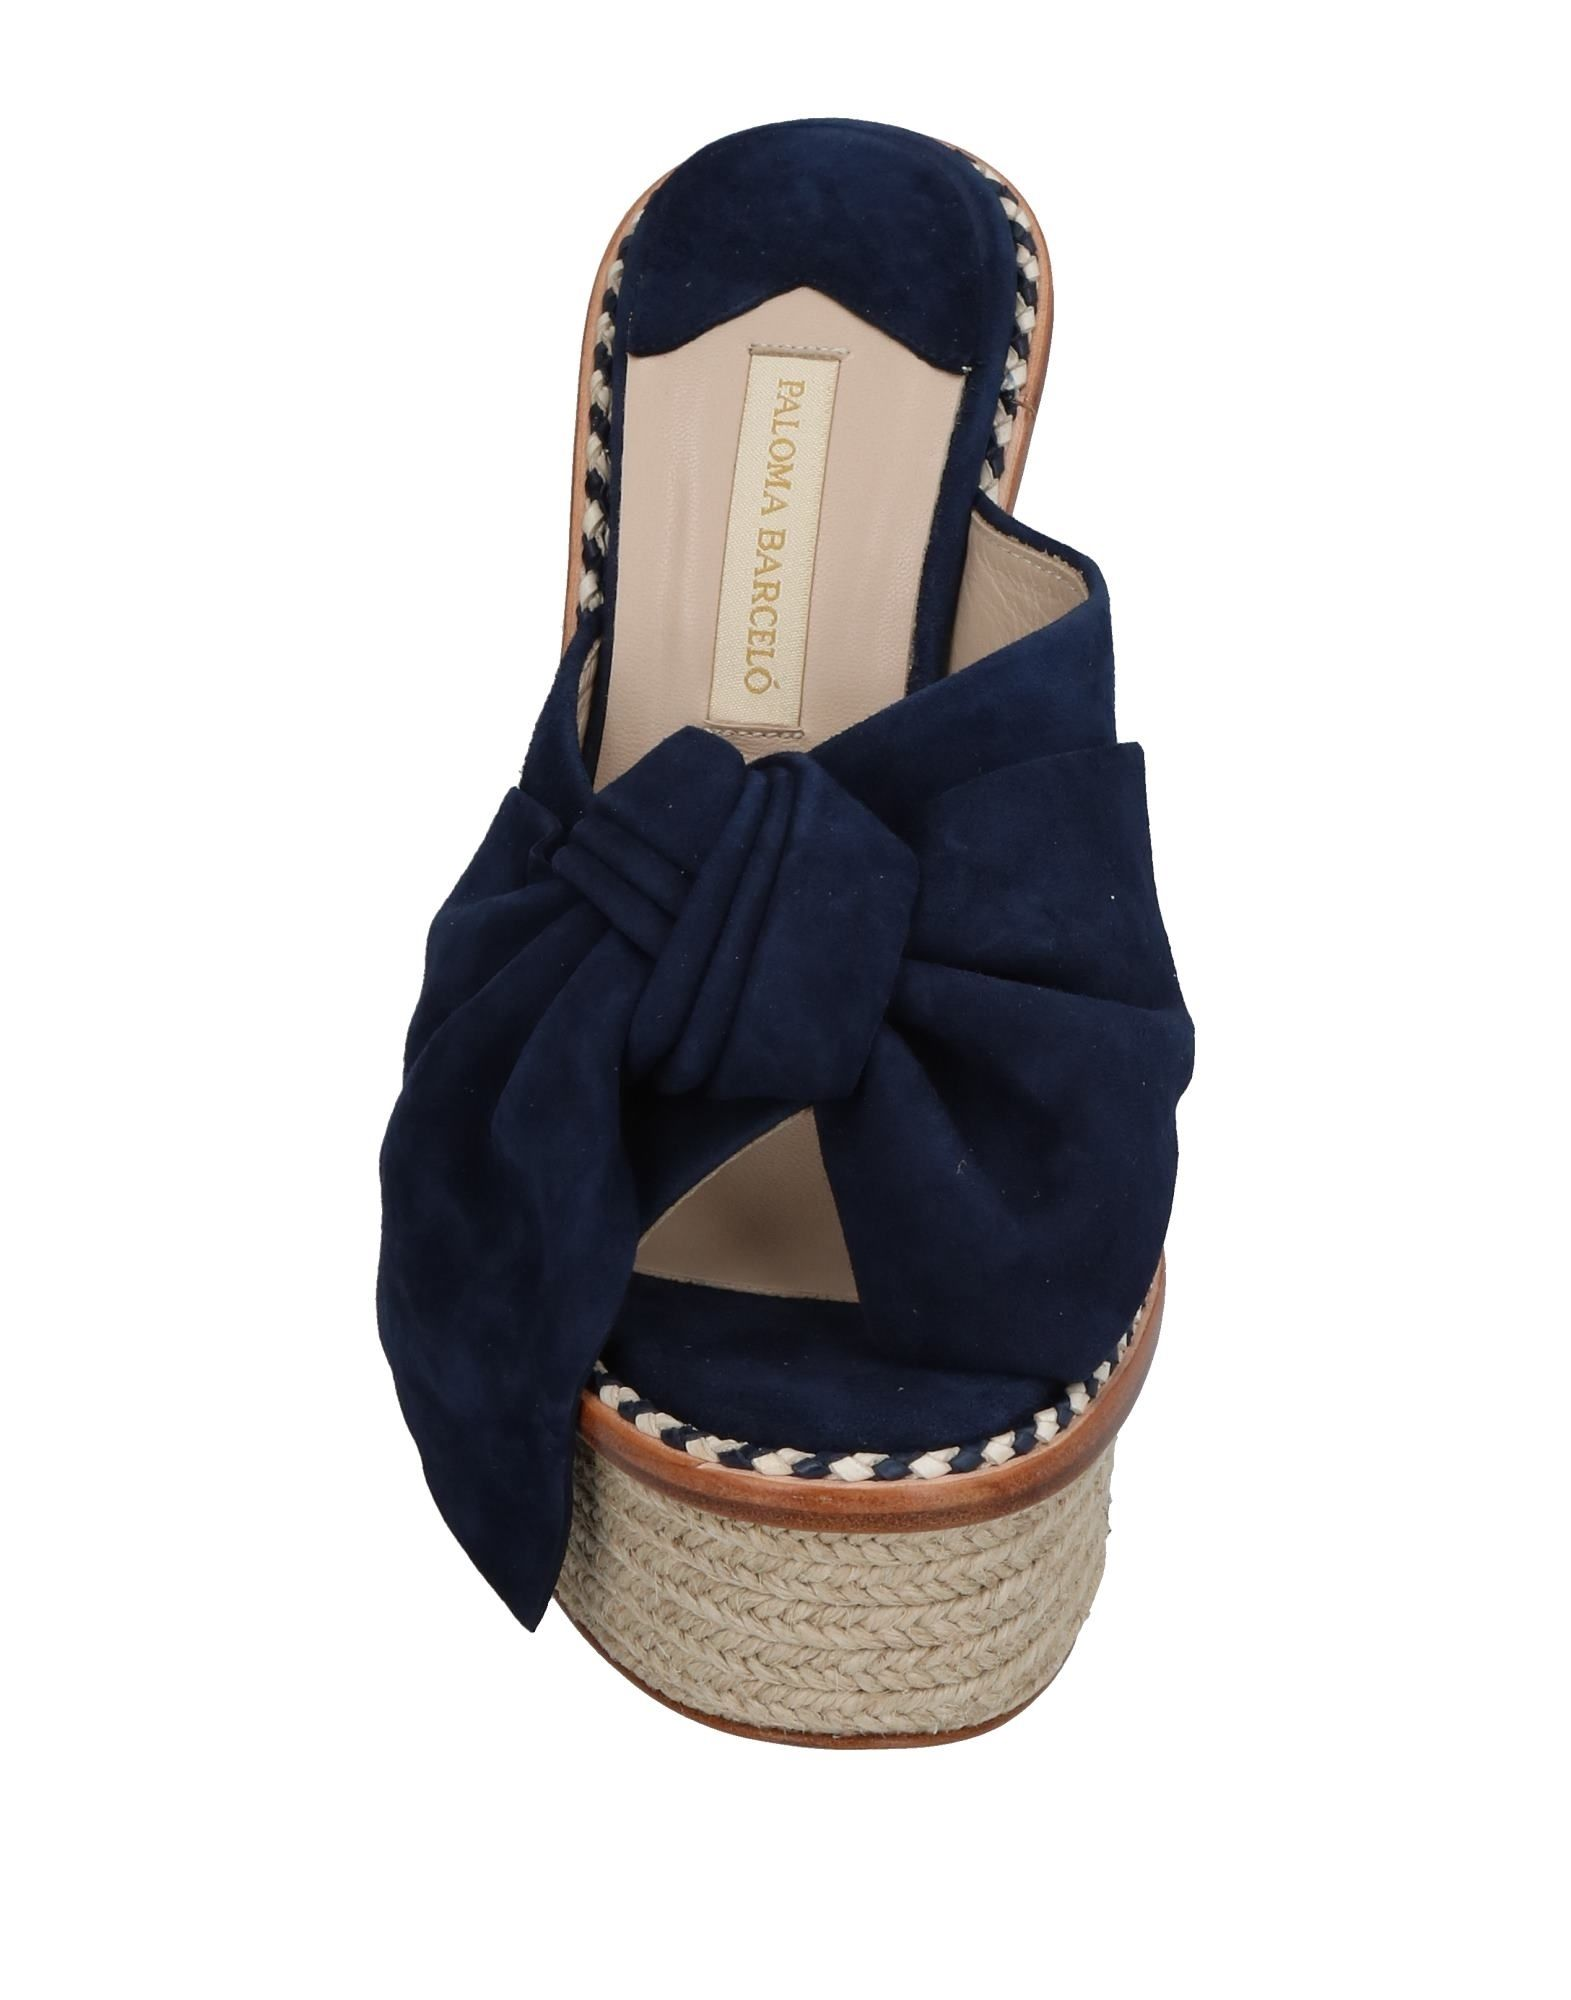 Stilvolle billige Schuhe Paloma Barceló Sandalen Damen  11383924PM